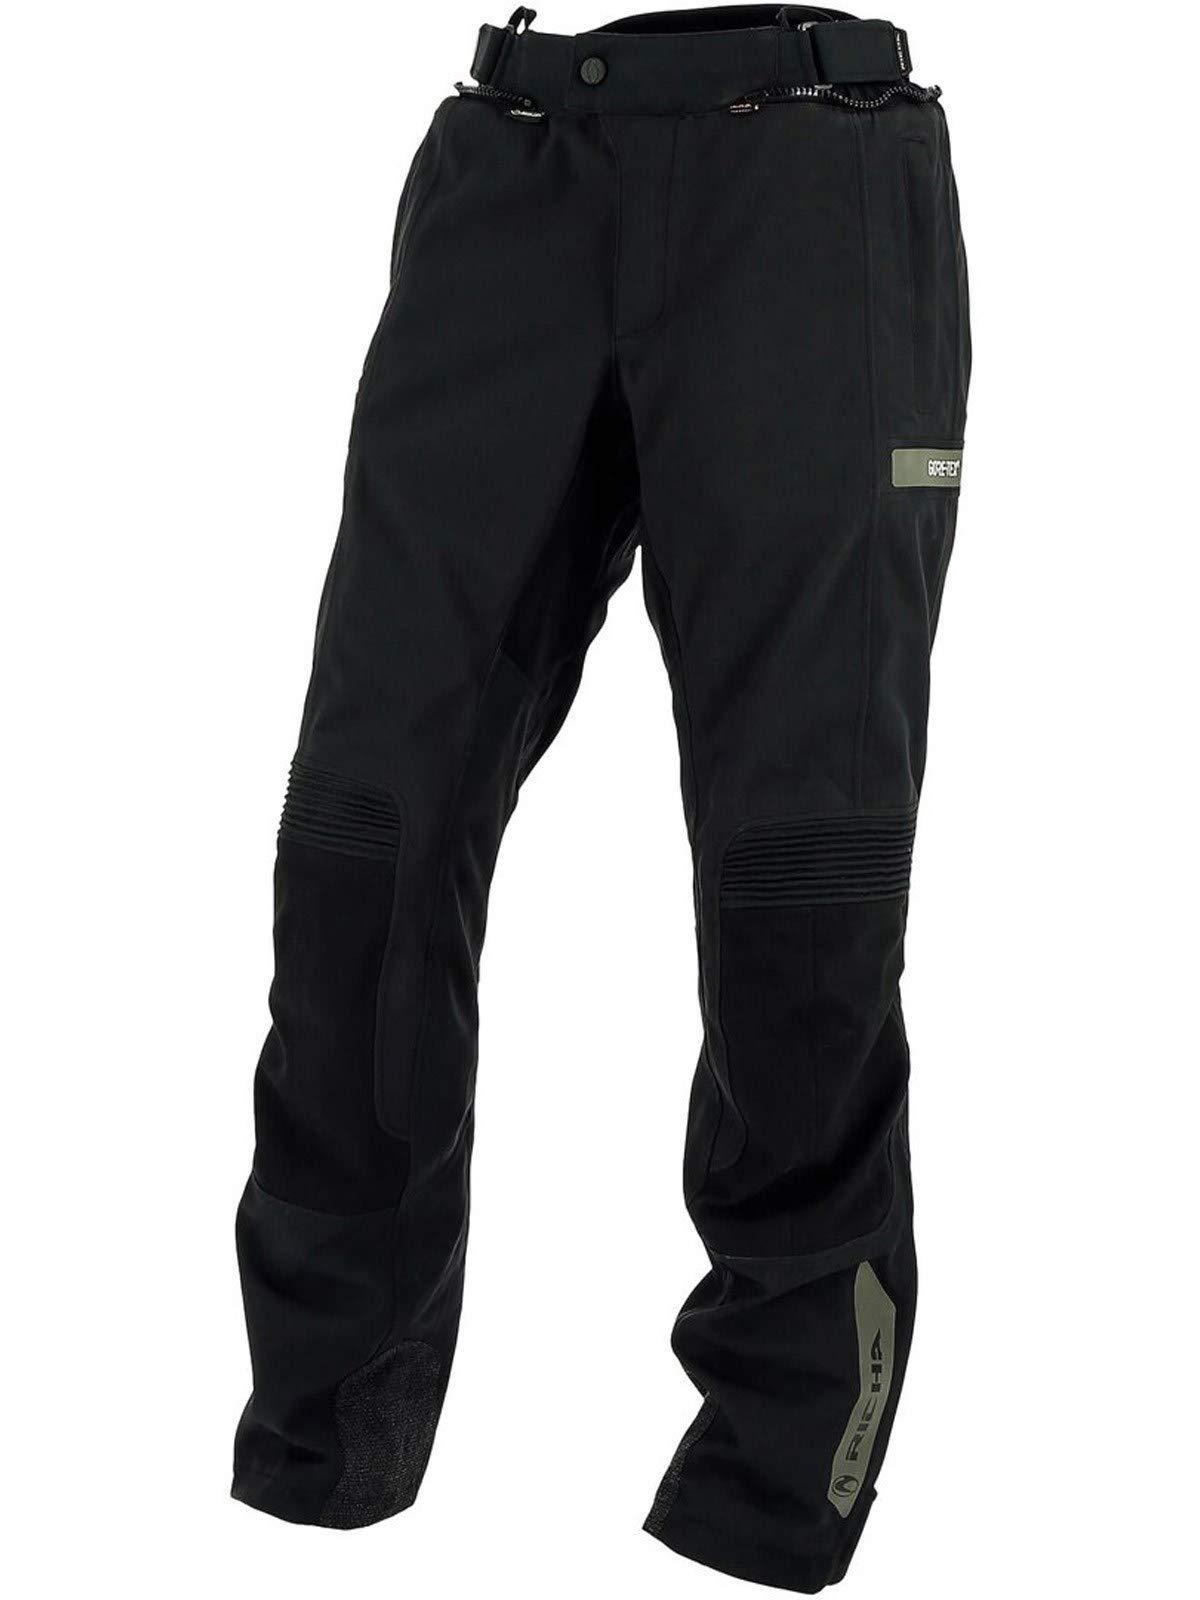 Richa Black Atlantic Gtx Short Motorcycle Waterproof Pants (L, Black)